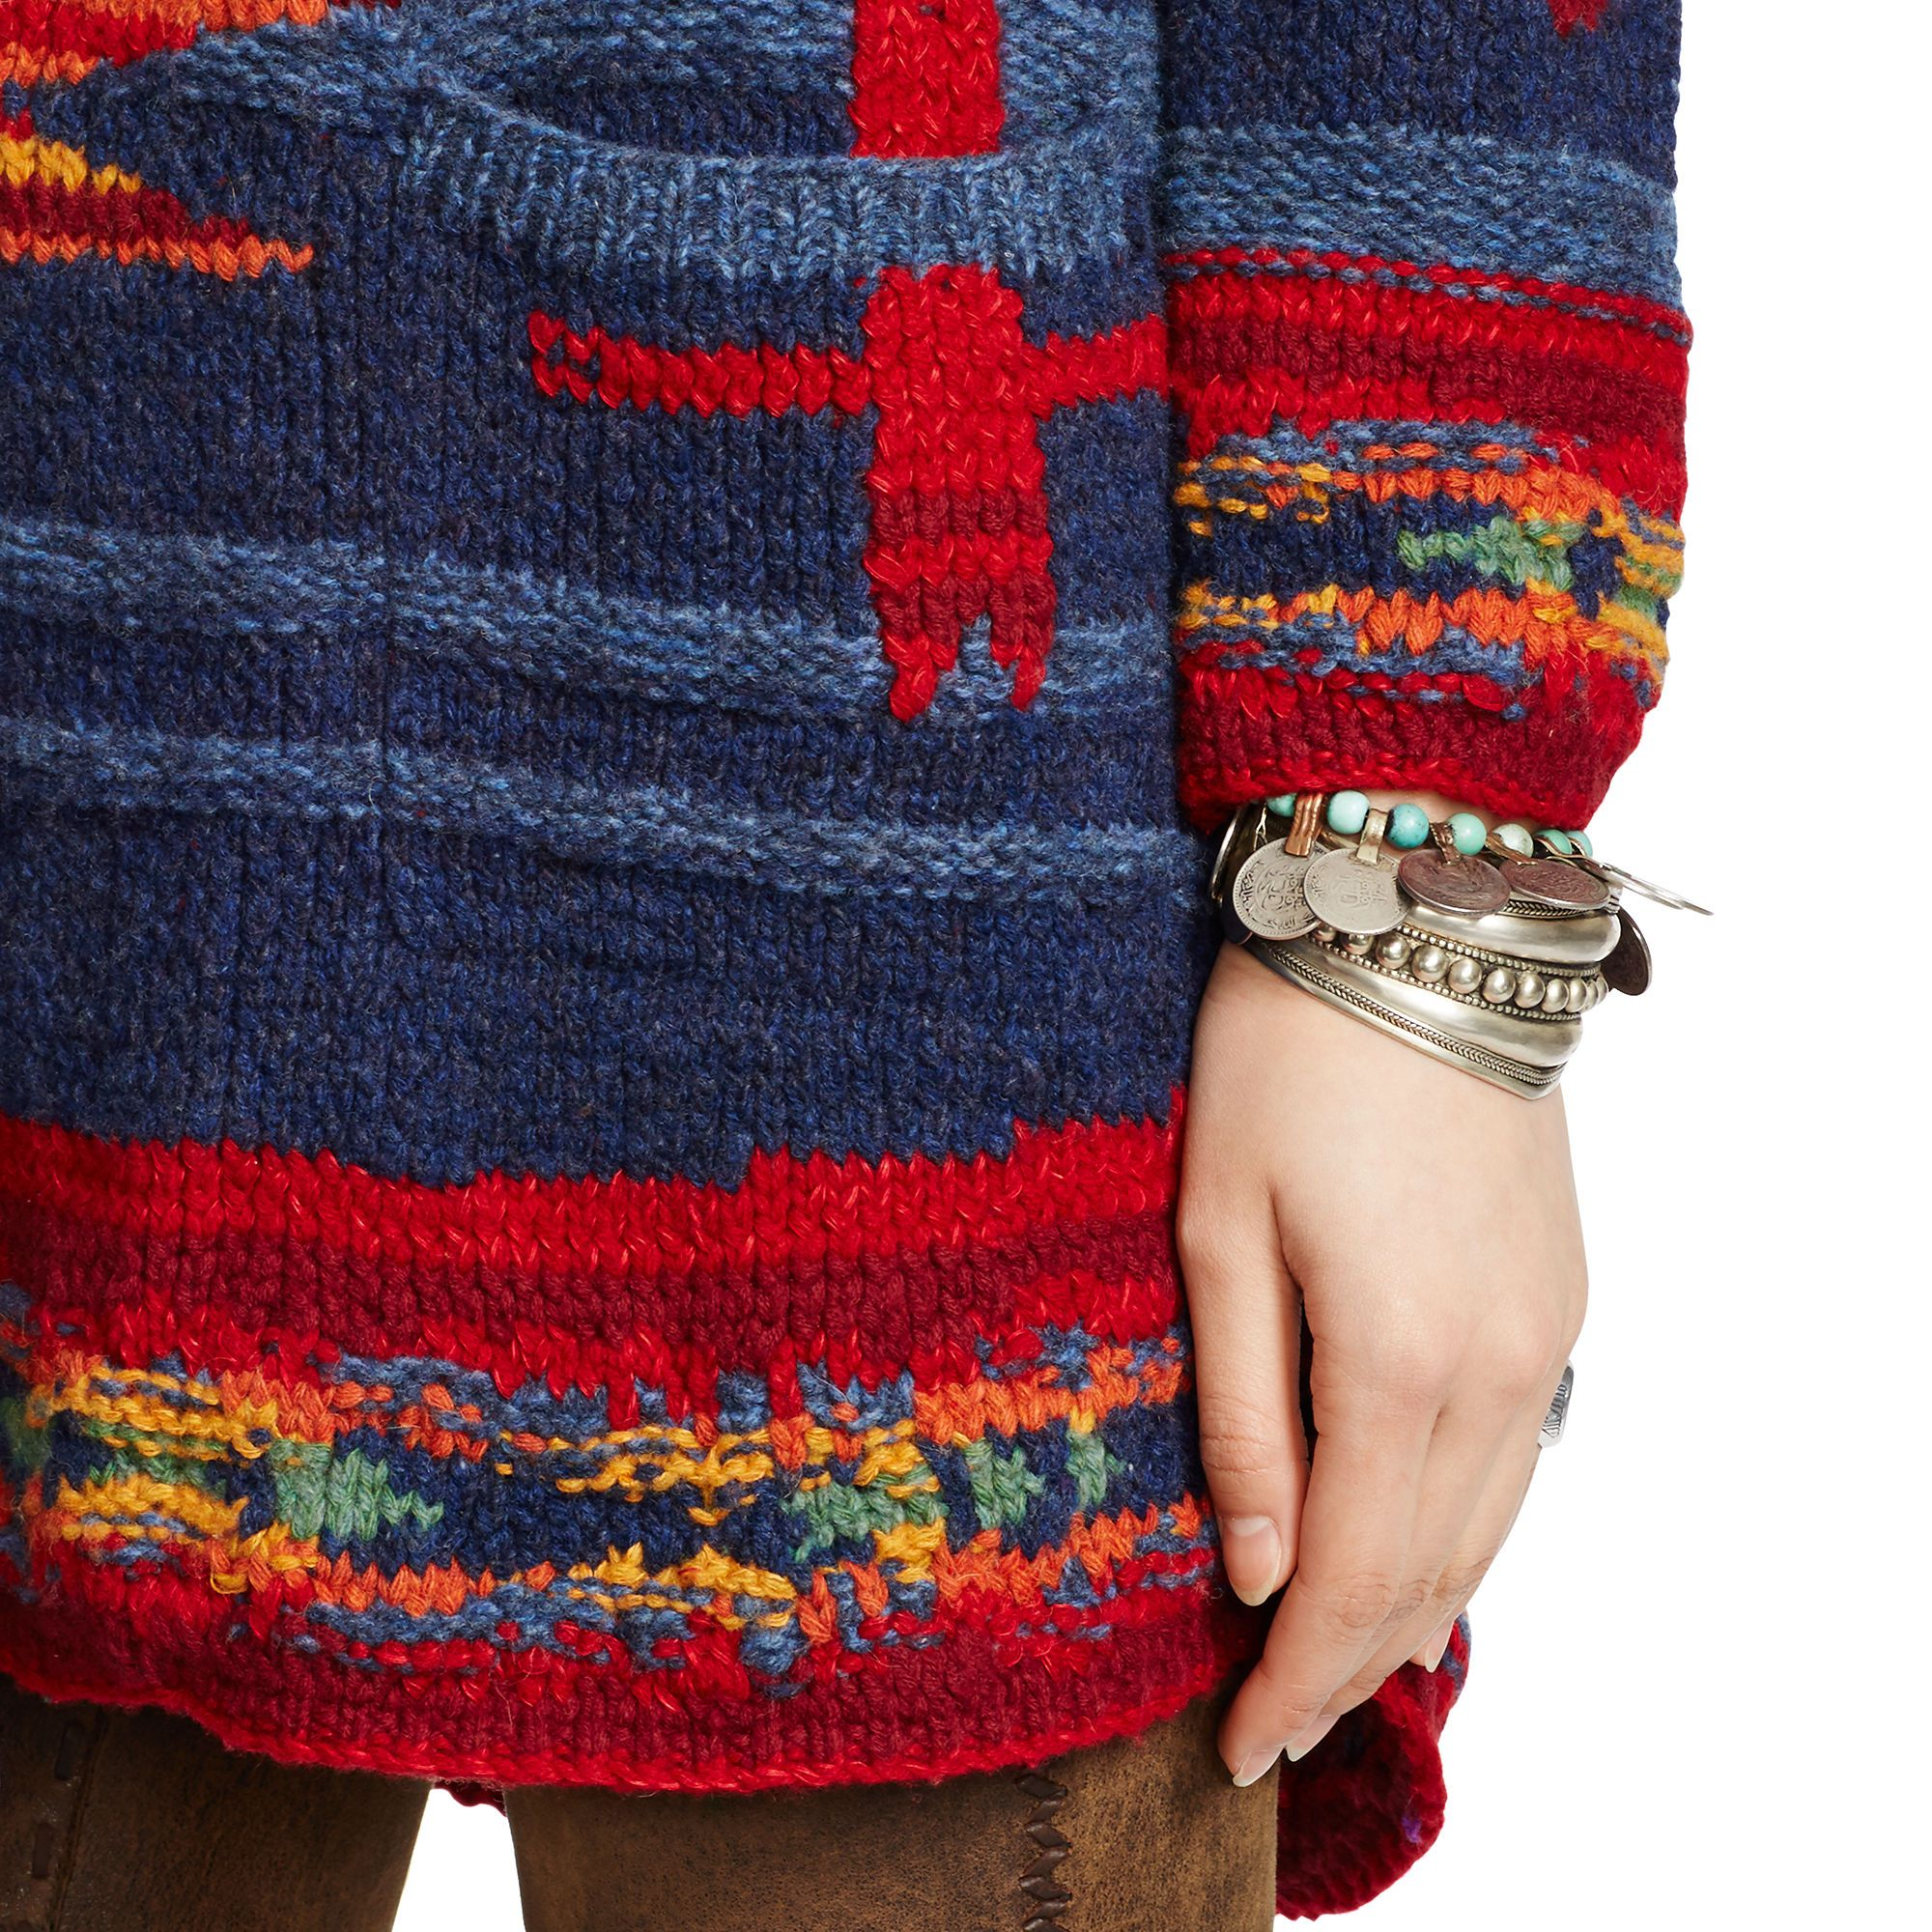 Southwestern Shawl Cardigan - Cardigans & Sweater Coats  Sweaters - RalphLauren.com